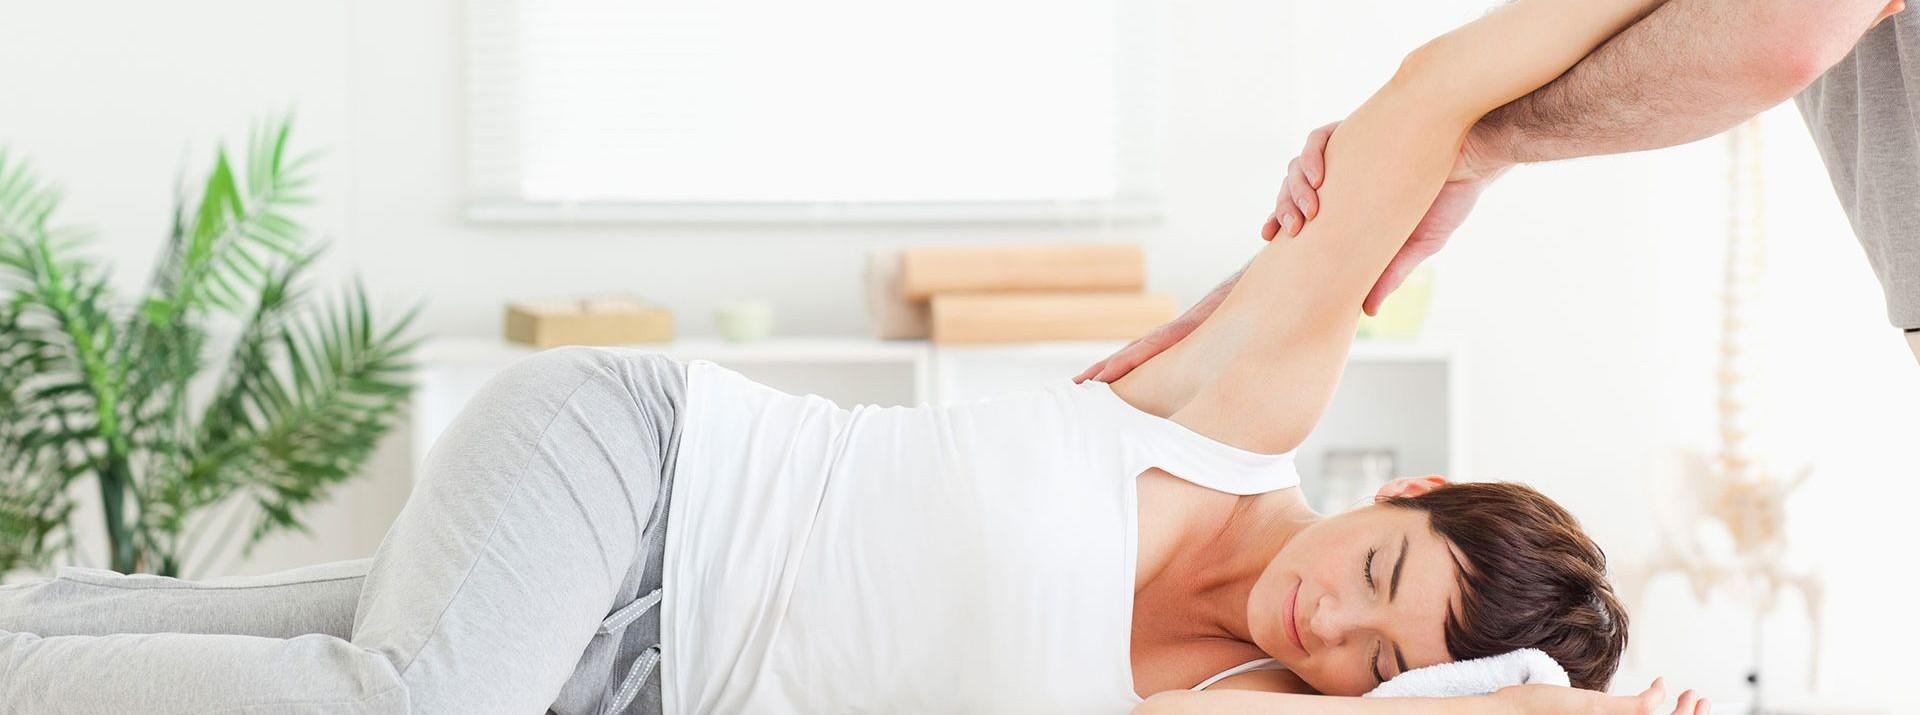 We are a unique massage therapy clinic